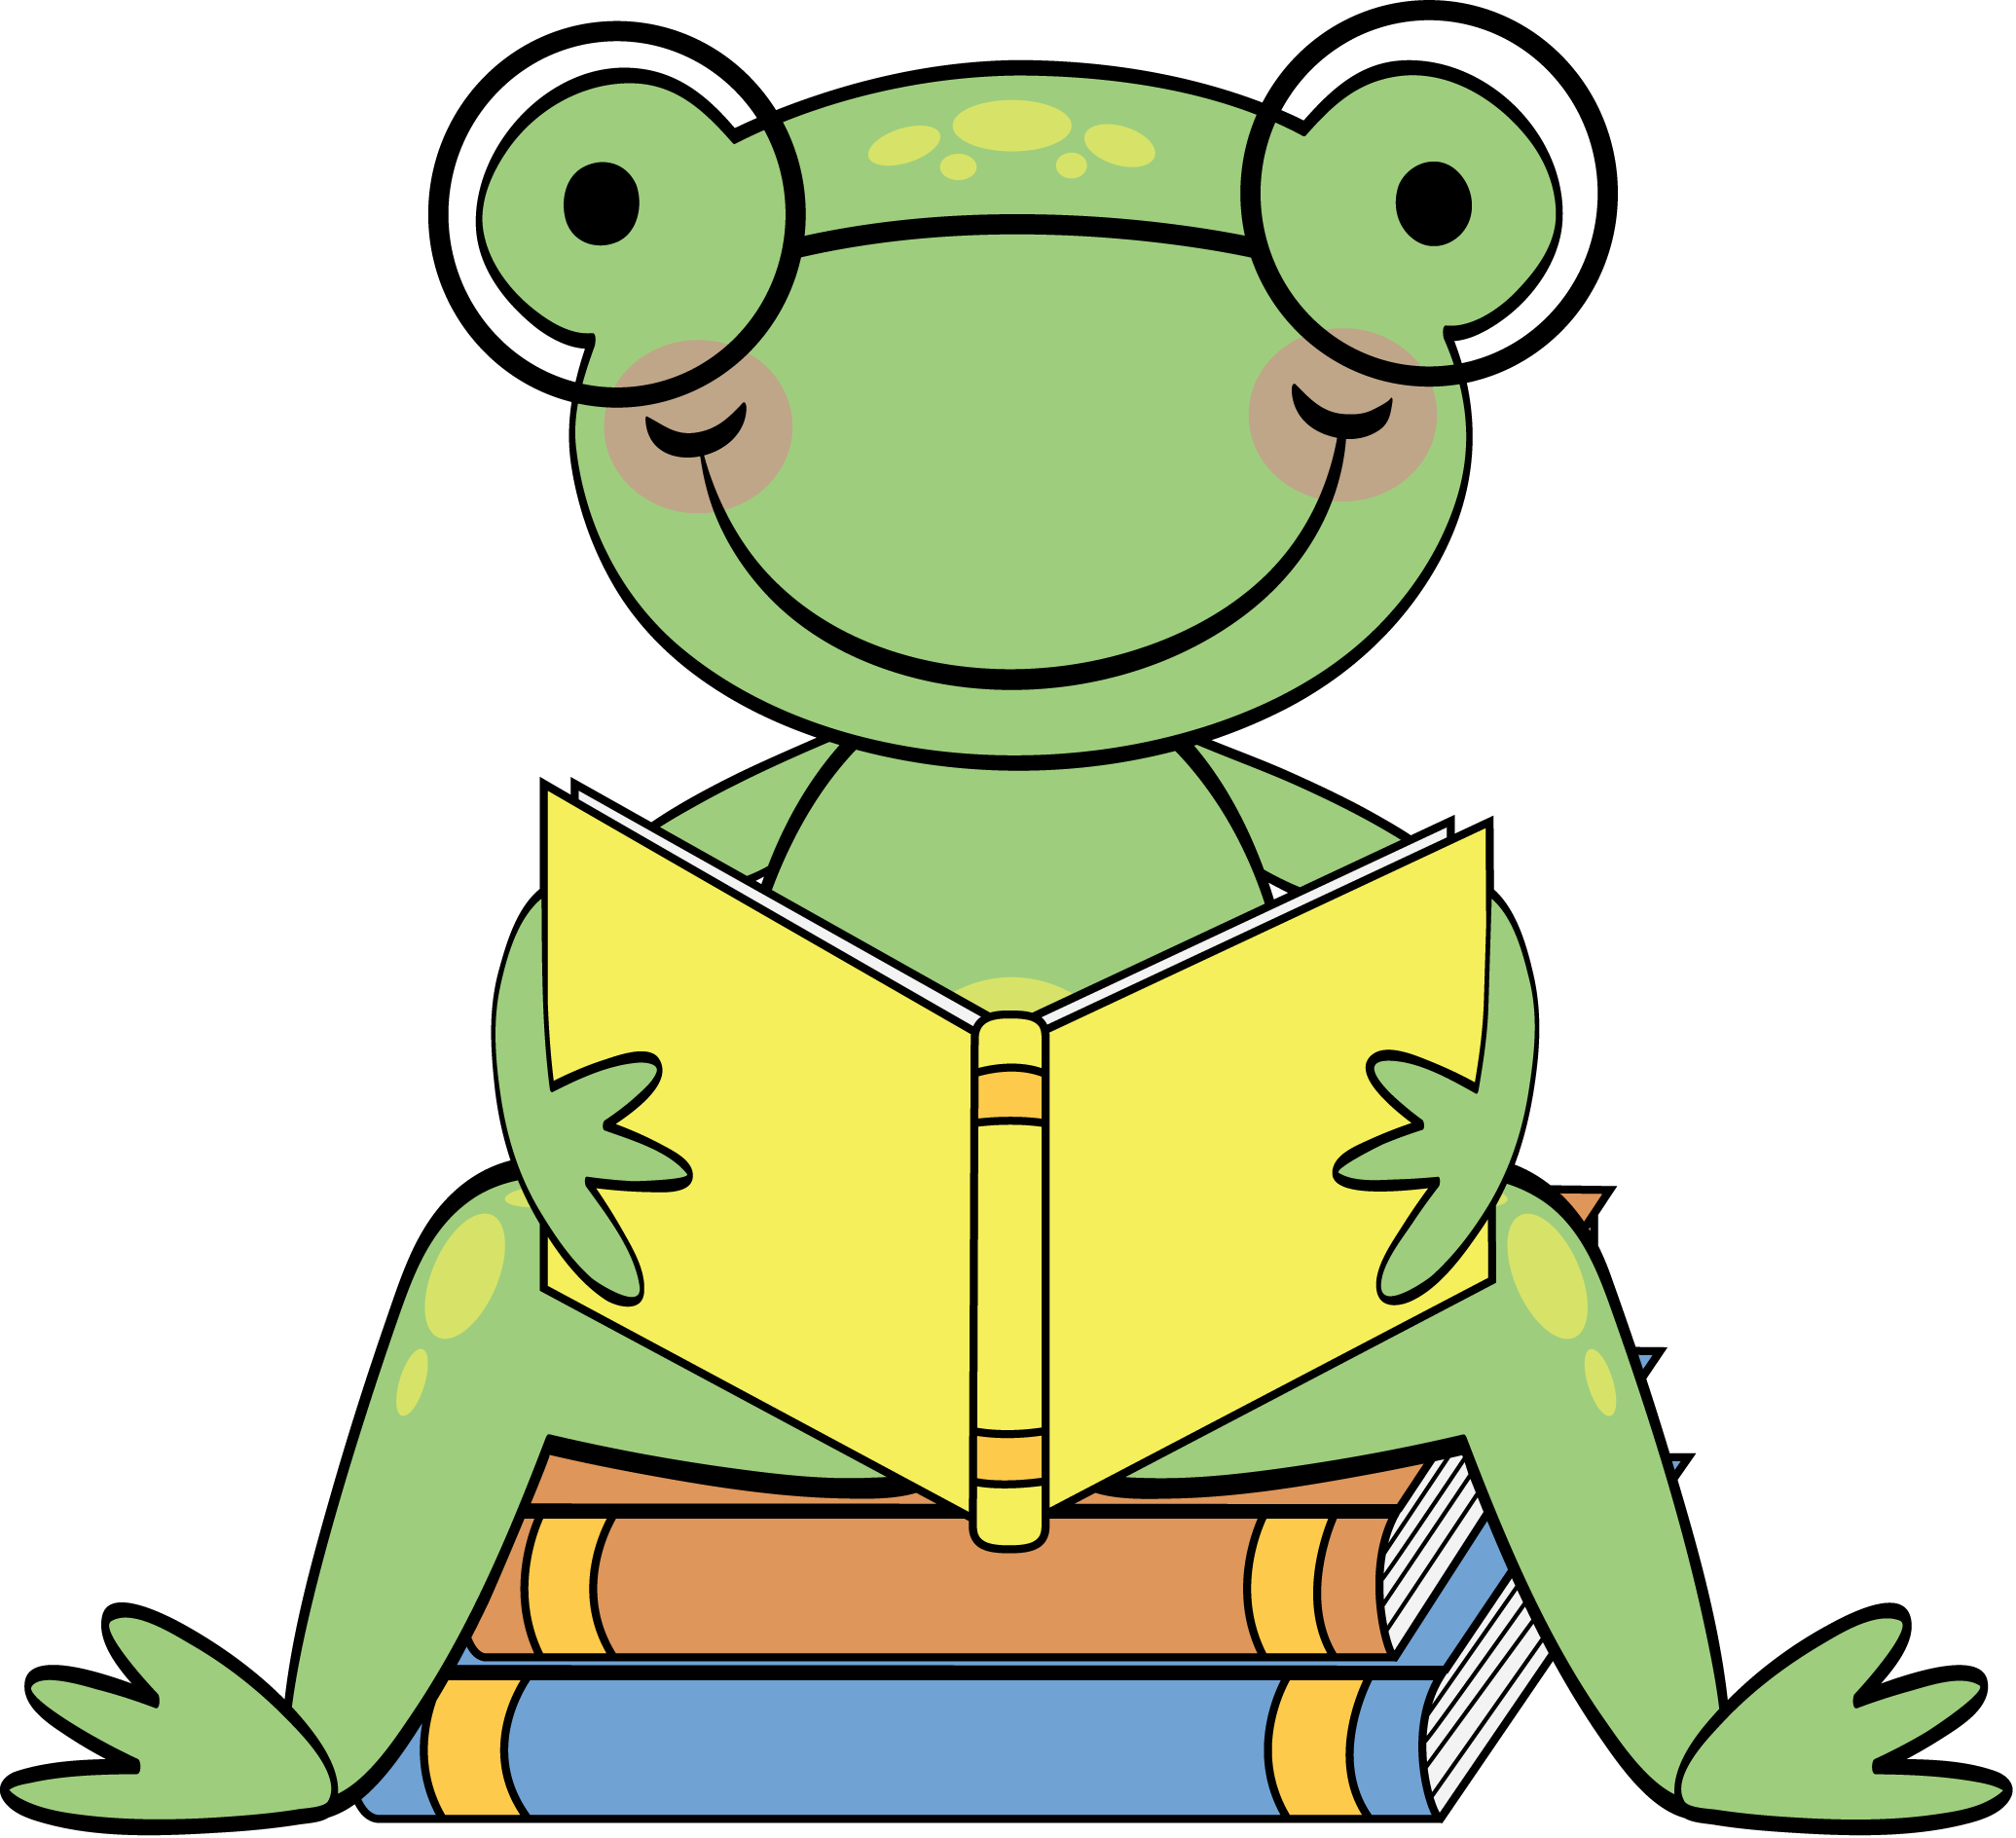 Http sunnydaypublishing com books. Clipart book frog